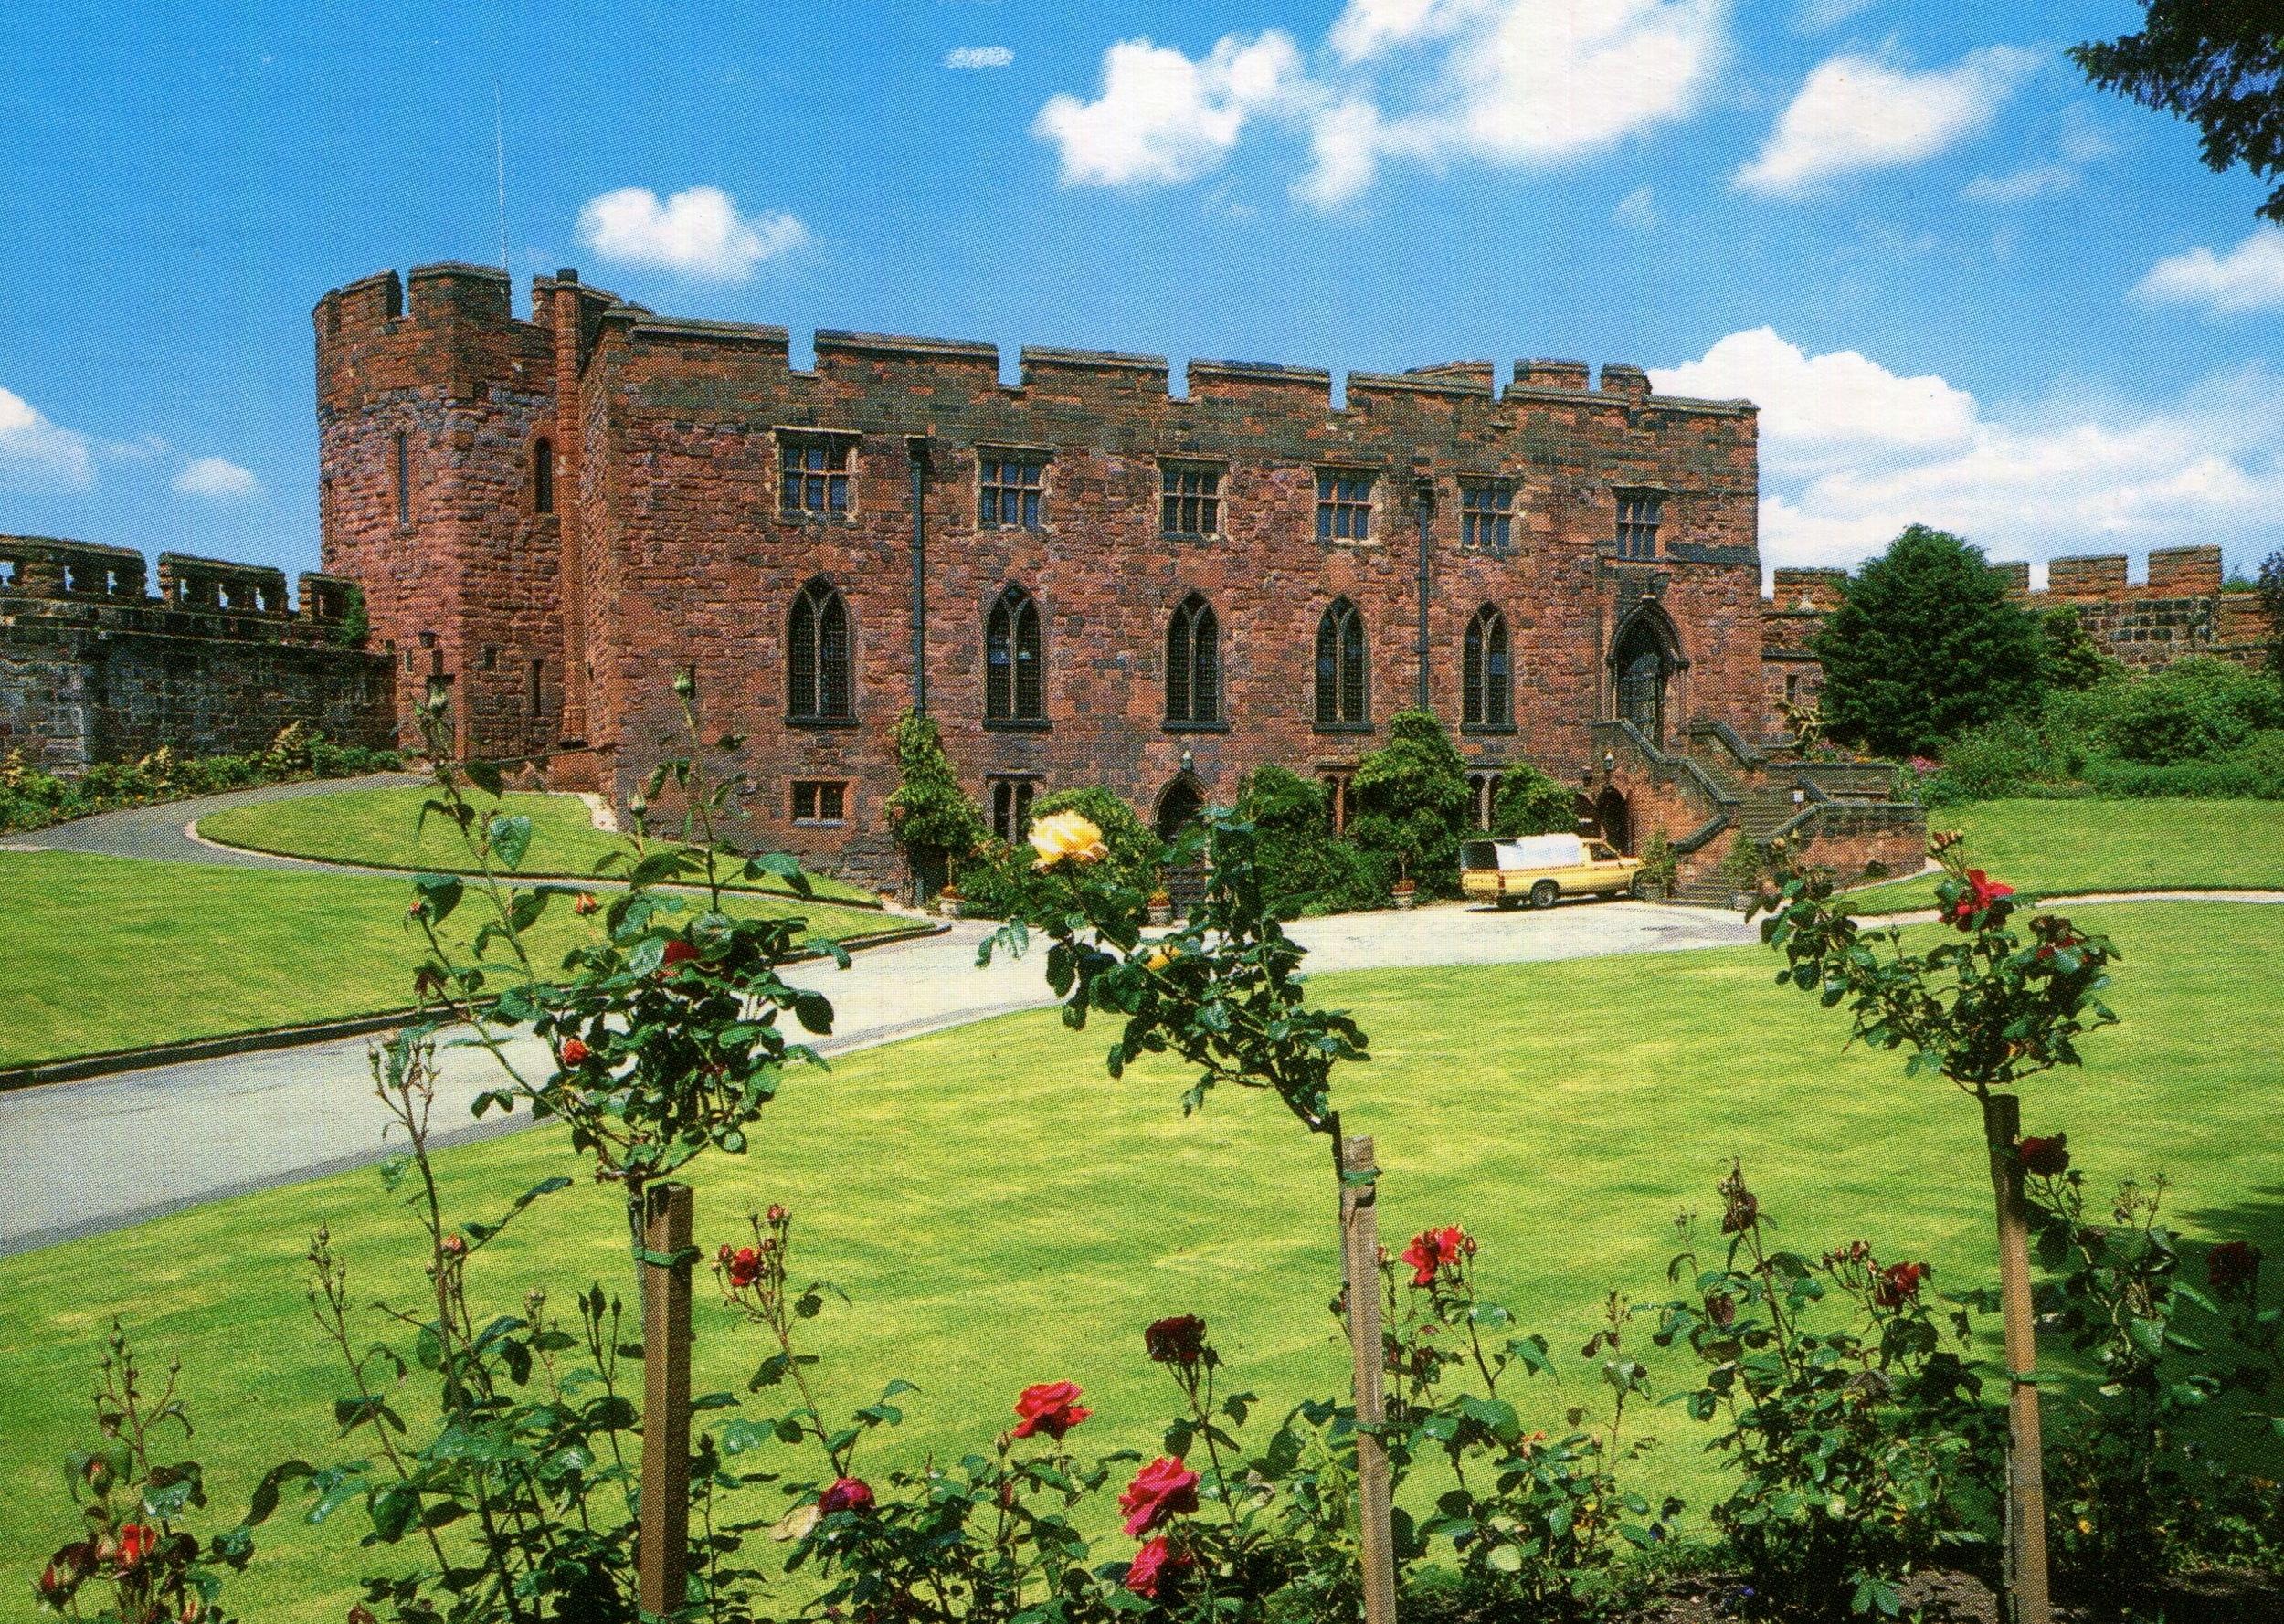 Shrewsbury Castle, England